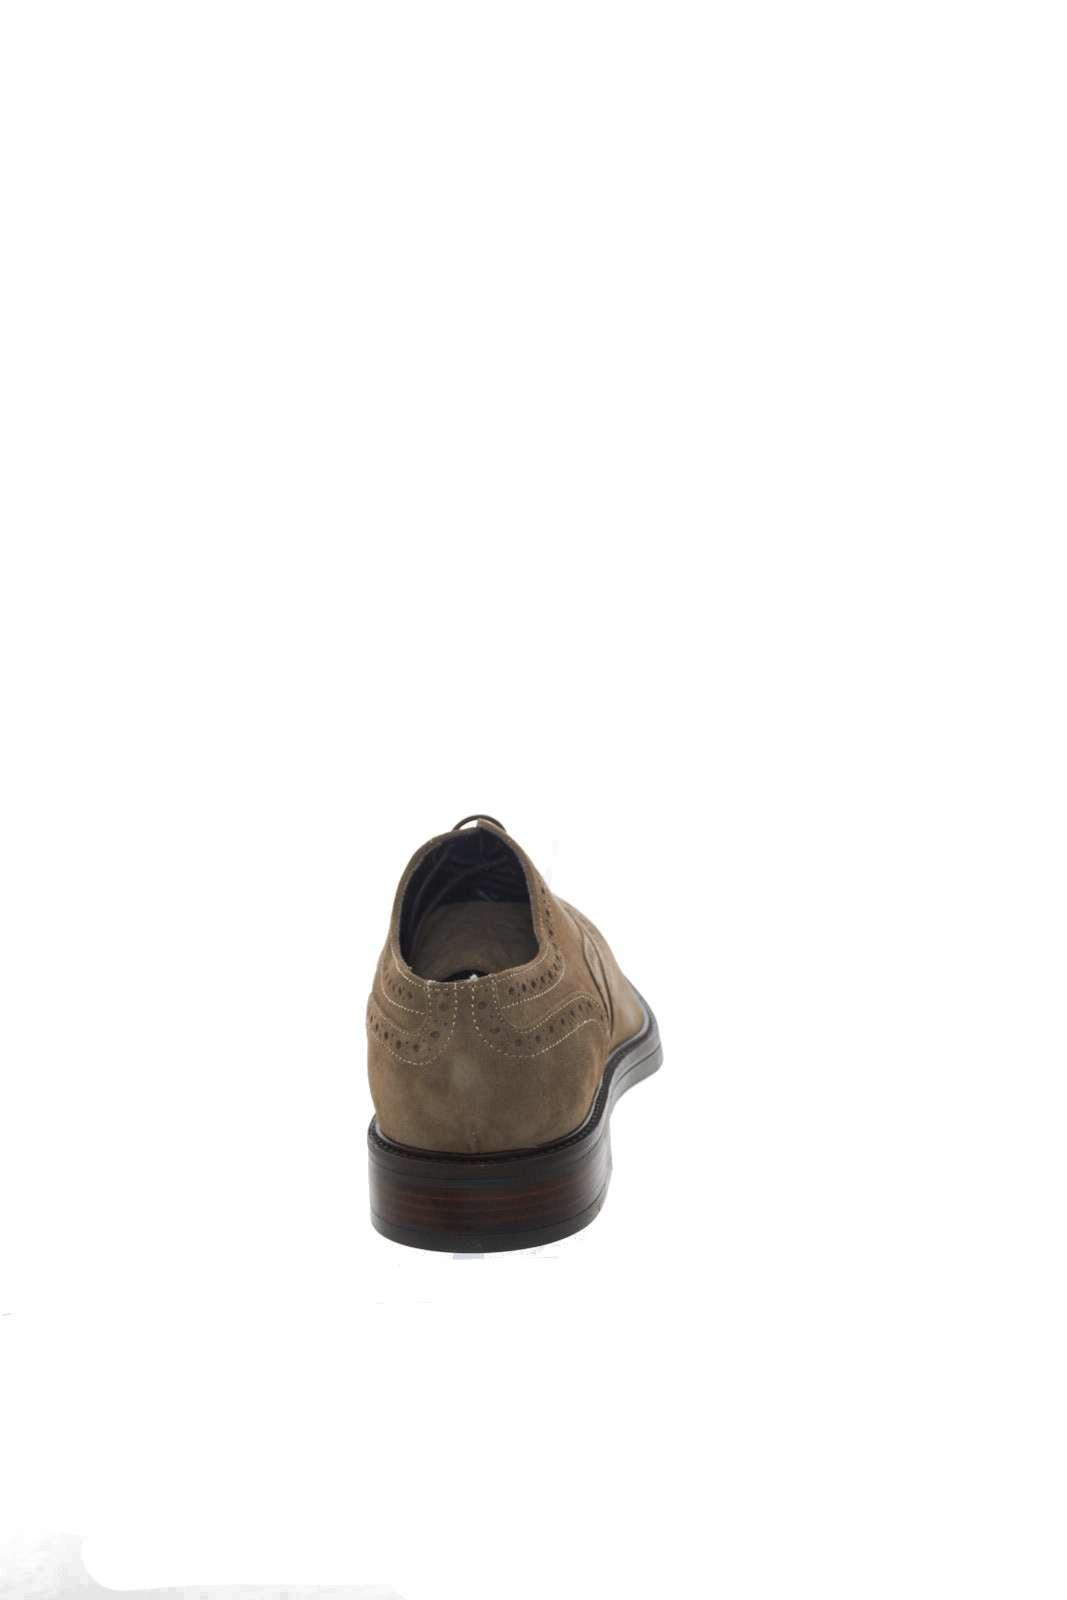 https://www.parmax.com/media/catalog/product/a/i/AI-outlet_parmax-scarpe-uomo-Libero%20Fashion-7582-D.jpg